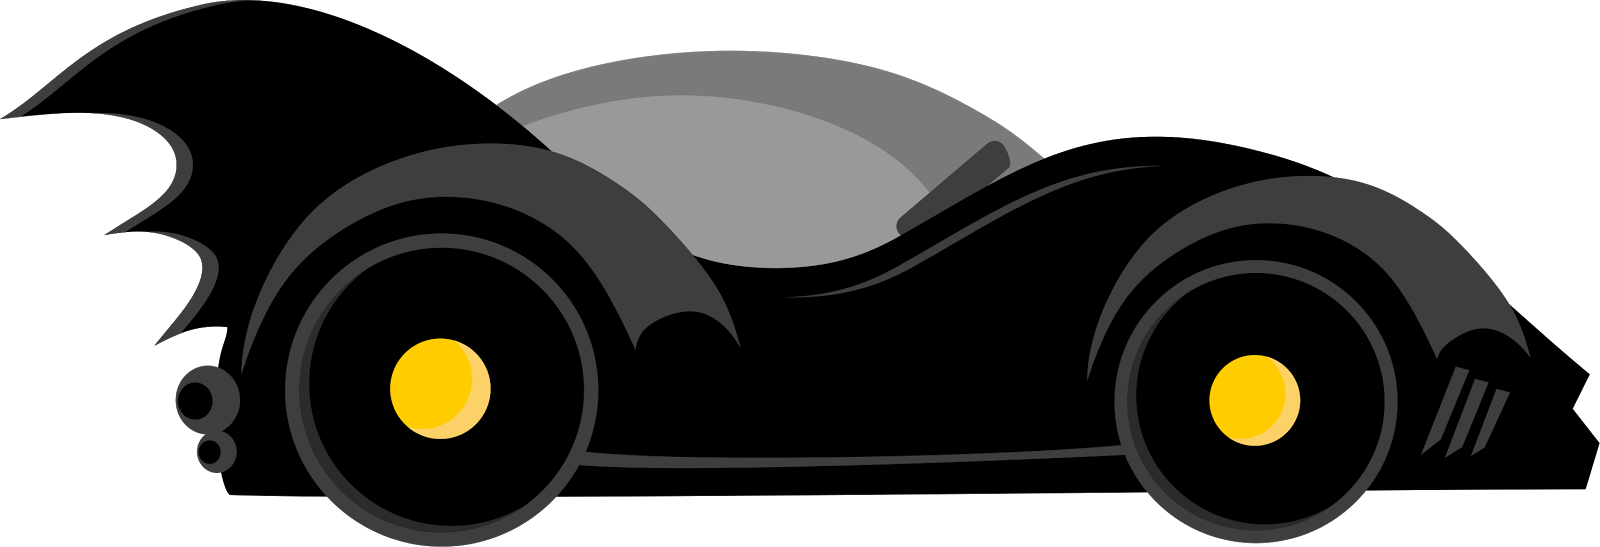 Batman clip art bat. Clipart cars cute